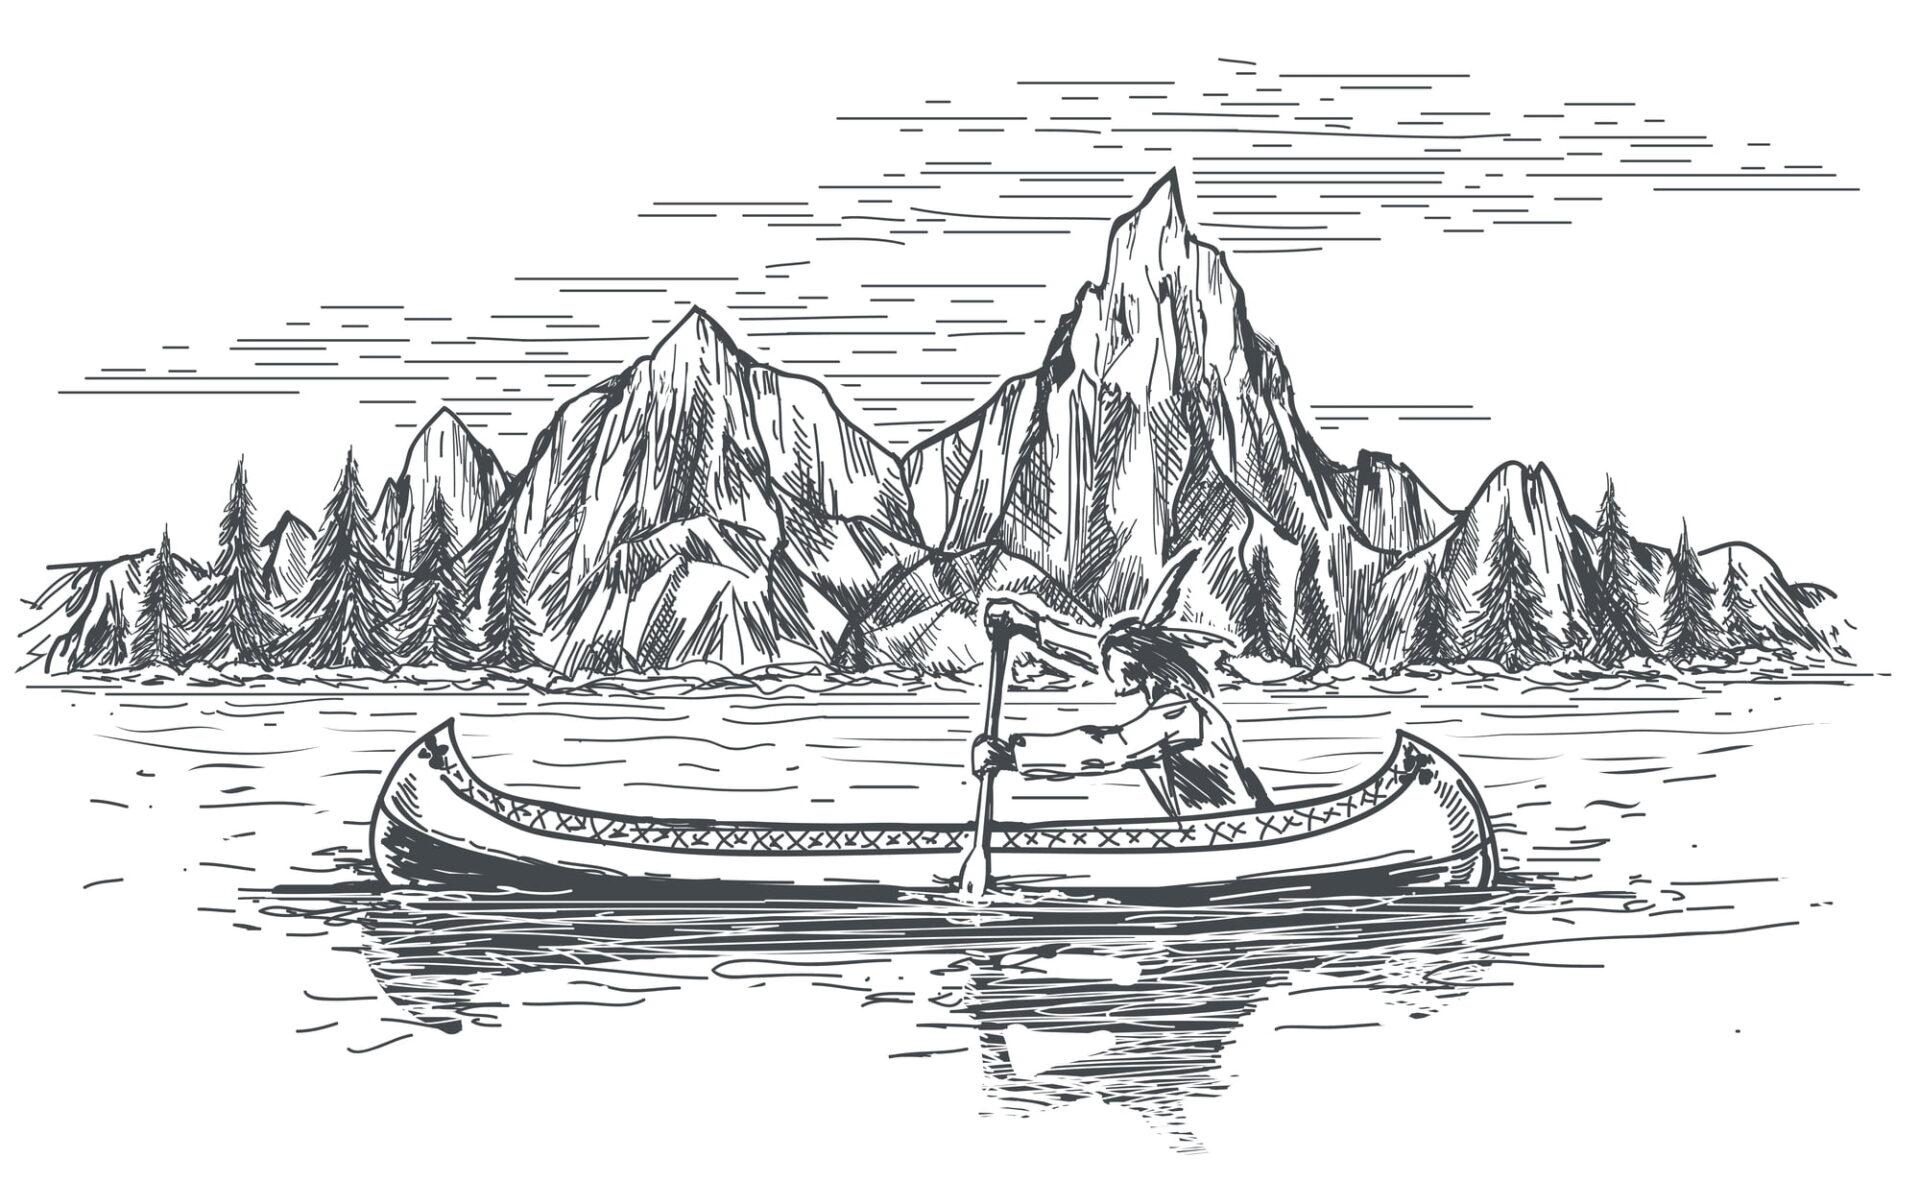 Sami fishing for salmon